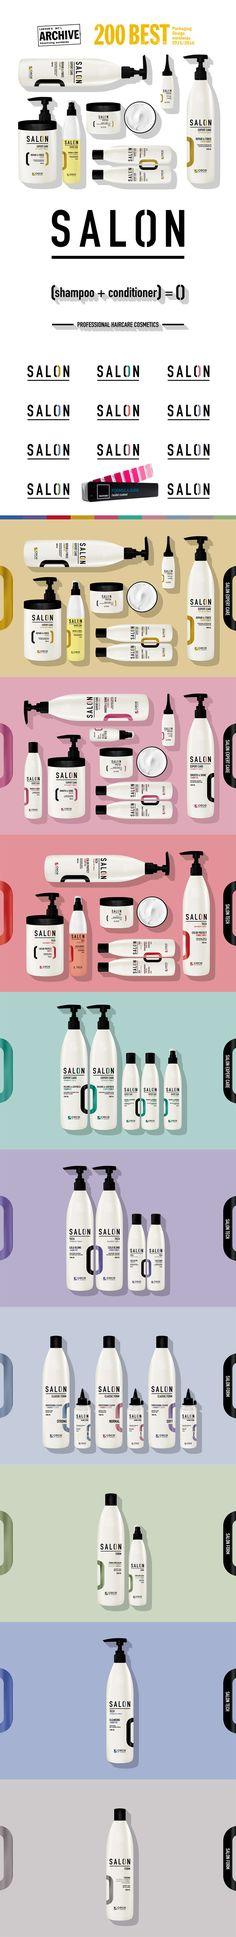 SALON - Professional hair care cosmetics packaging design - branding.